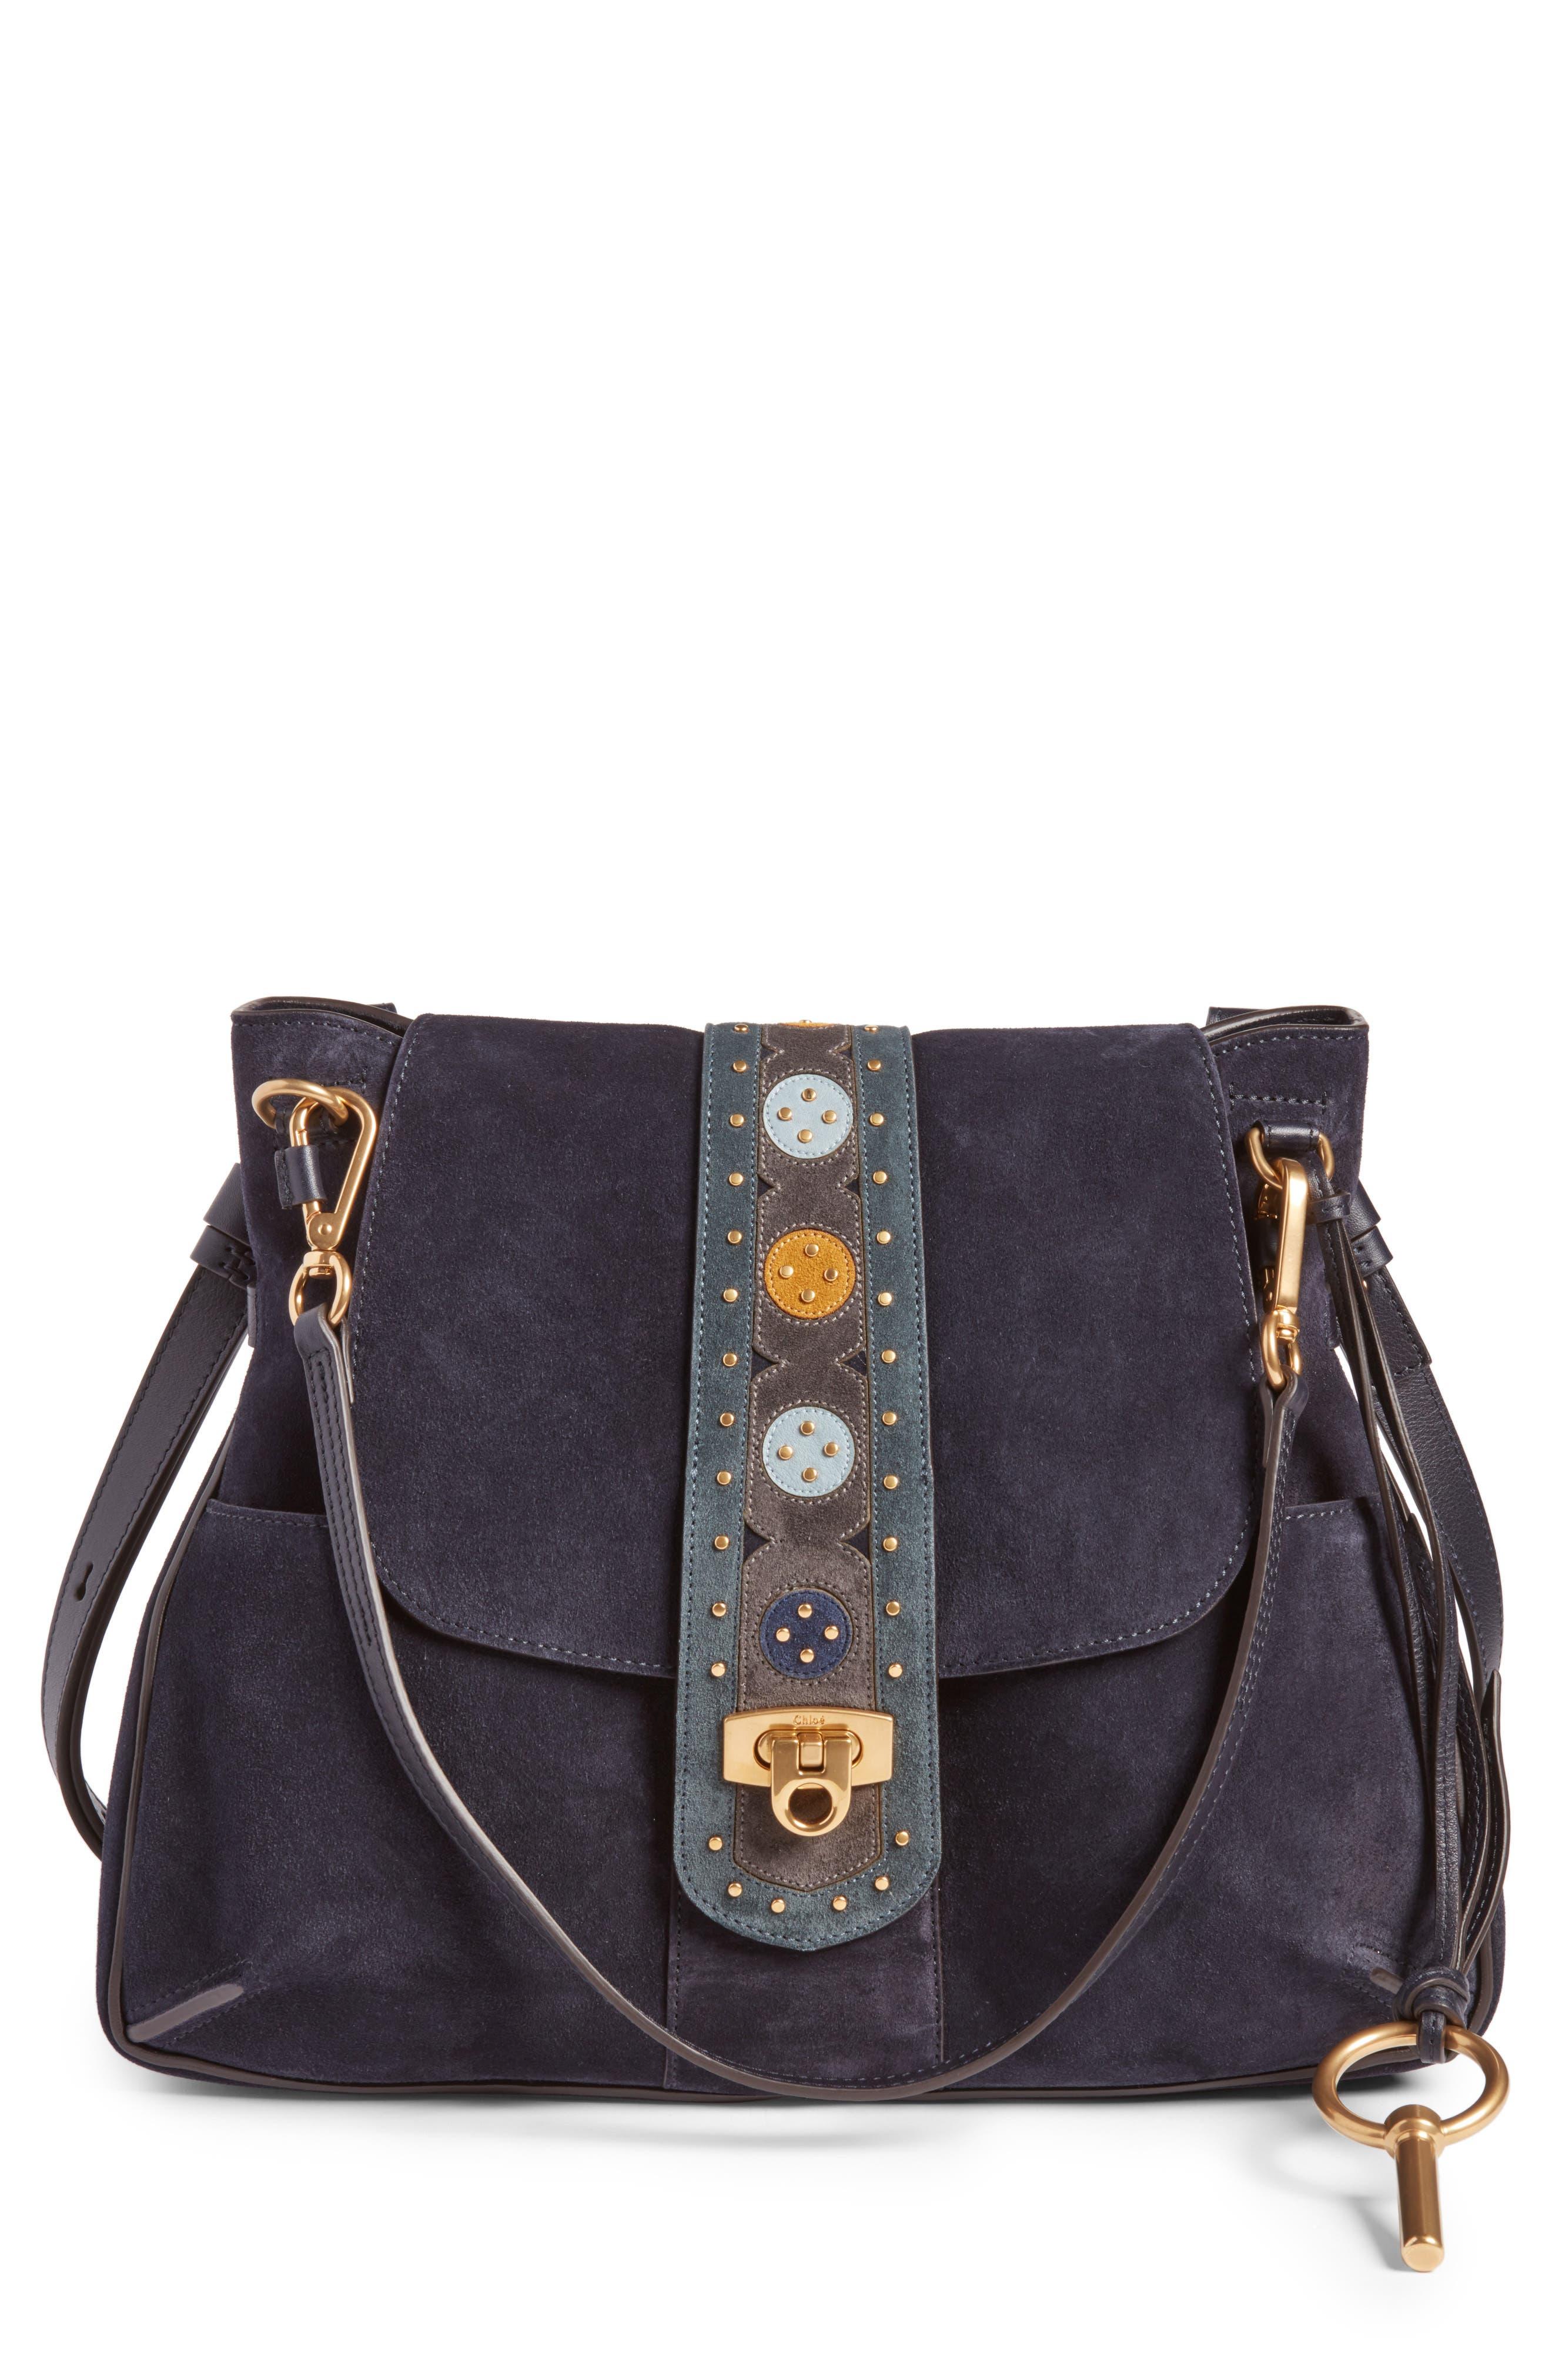 Medium Lexa Suede Shoulder Bag,                         Main,                         color, 412